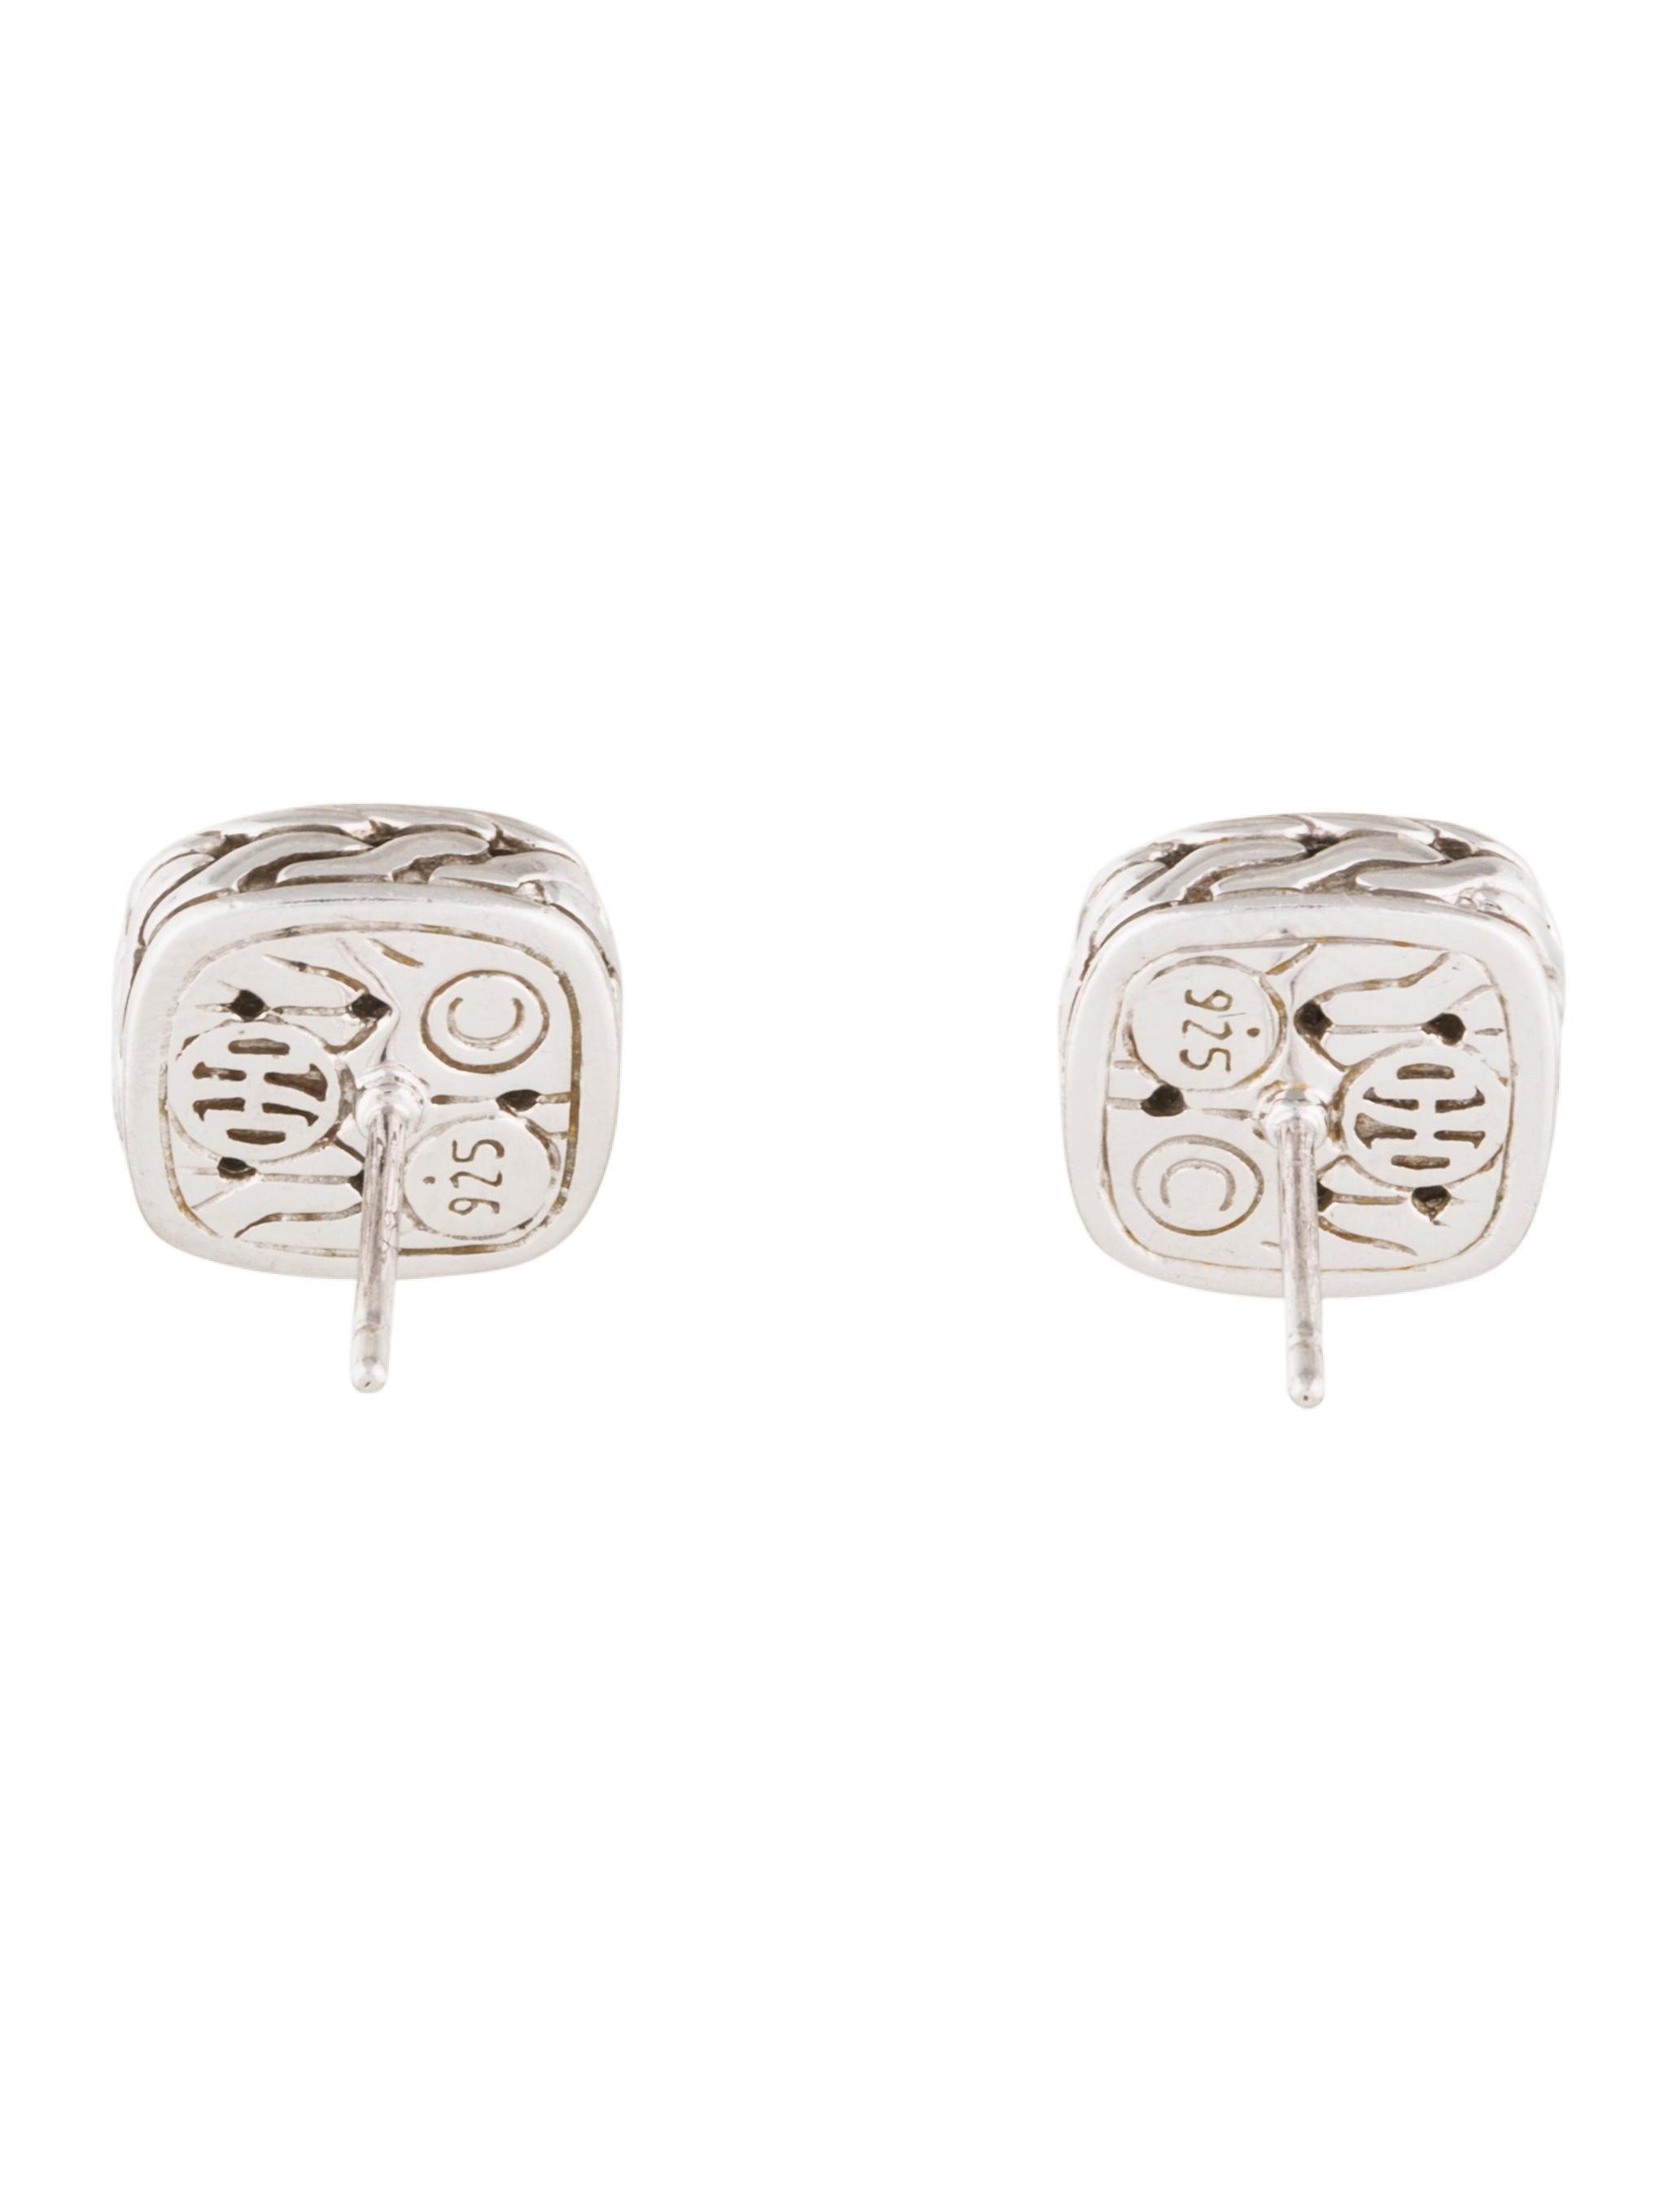 john hardy black sapphire small square stud earrings